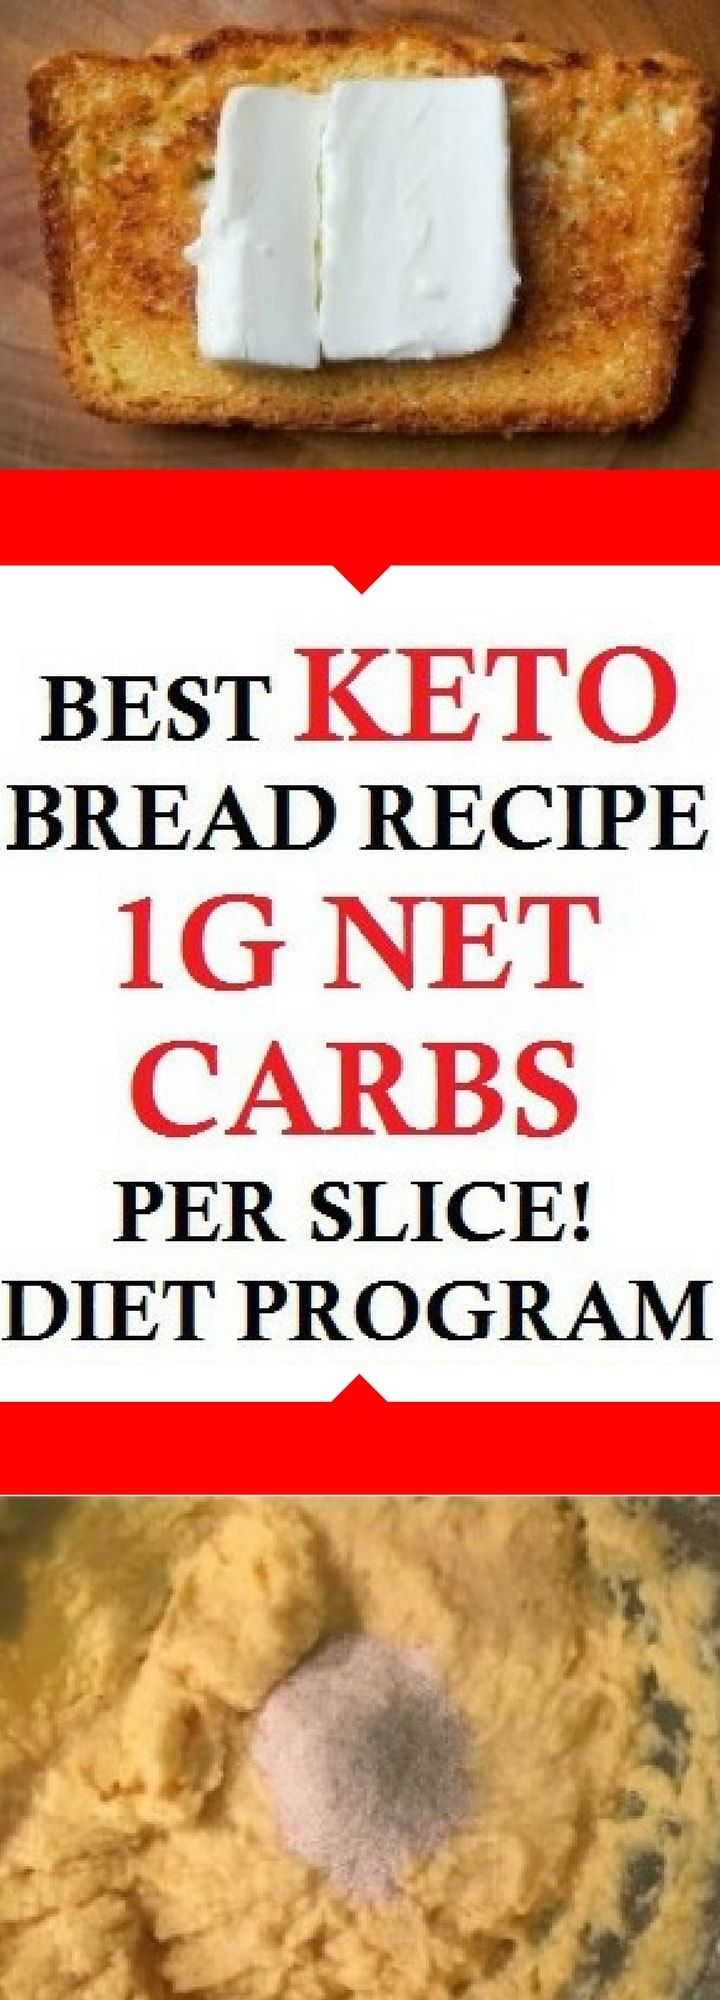 BEST KETO BREAD RECIPE | 1G NET CARBS PER SLICE! DIET PROGRAM